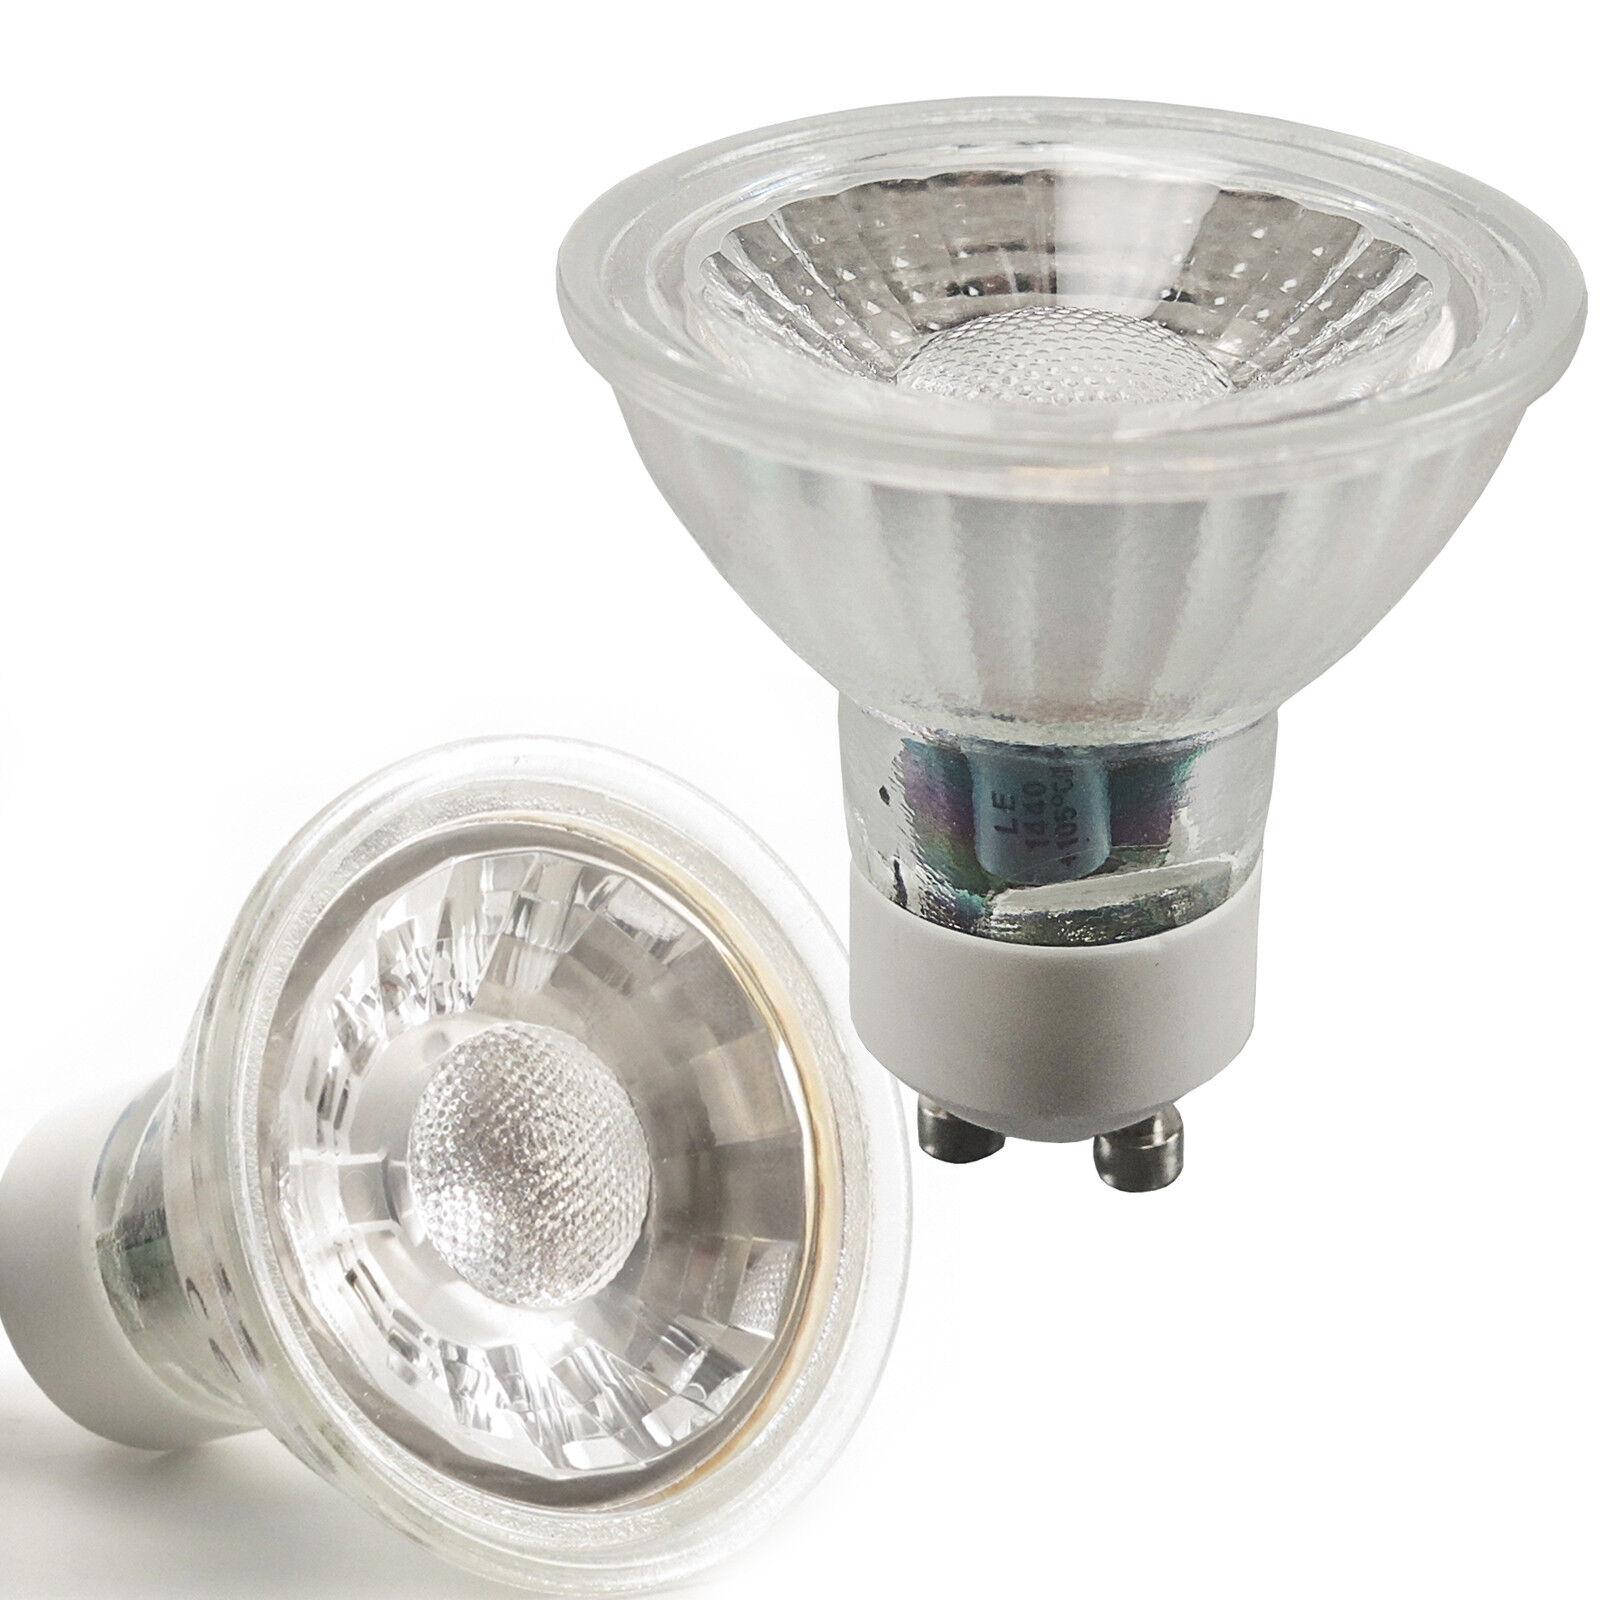 5 10 20x LED MCOB Leuchtmittel Glas GU10 230V 3W 5W Lampe Birne Spot Licht